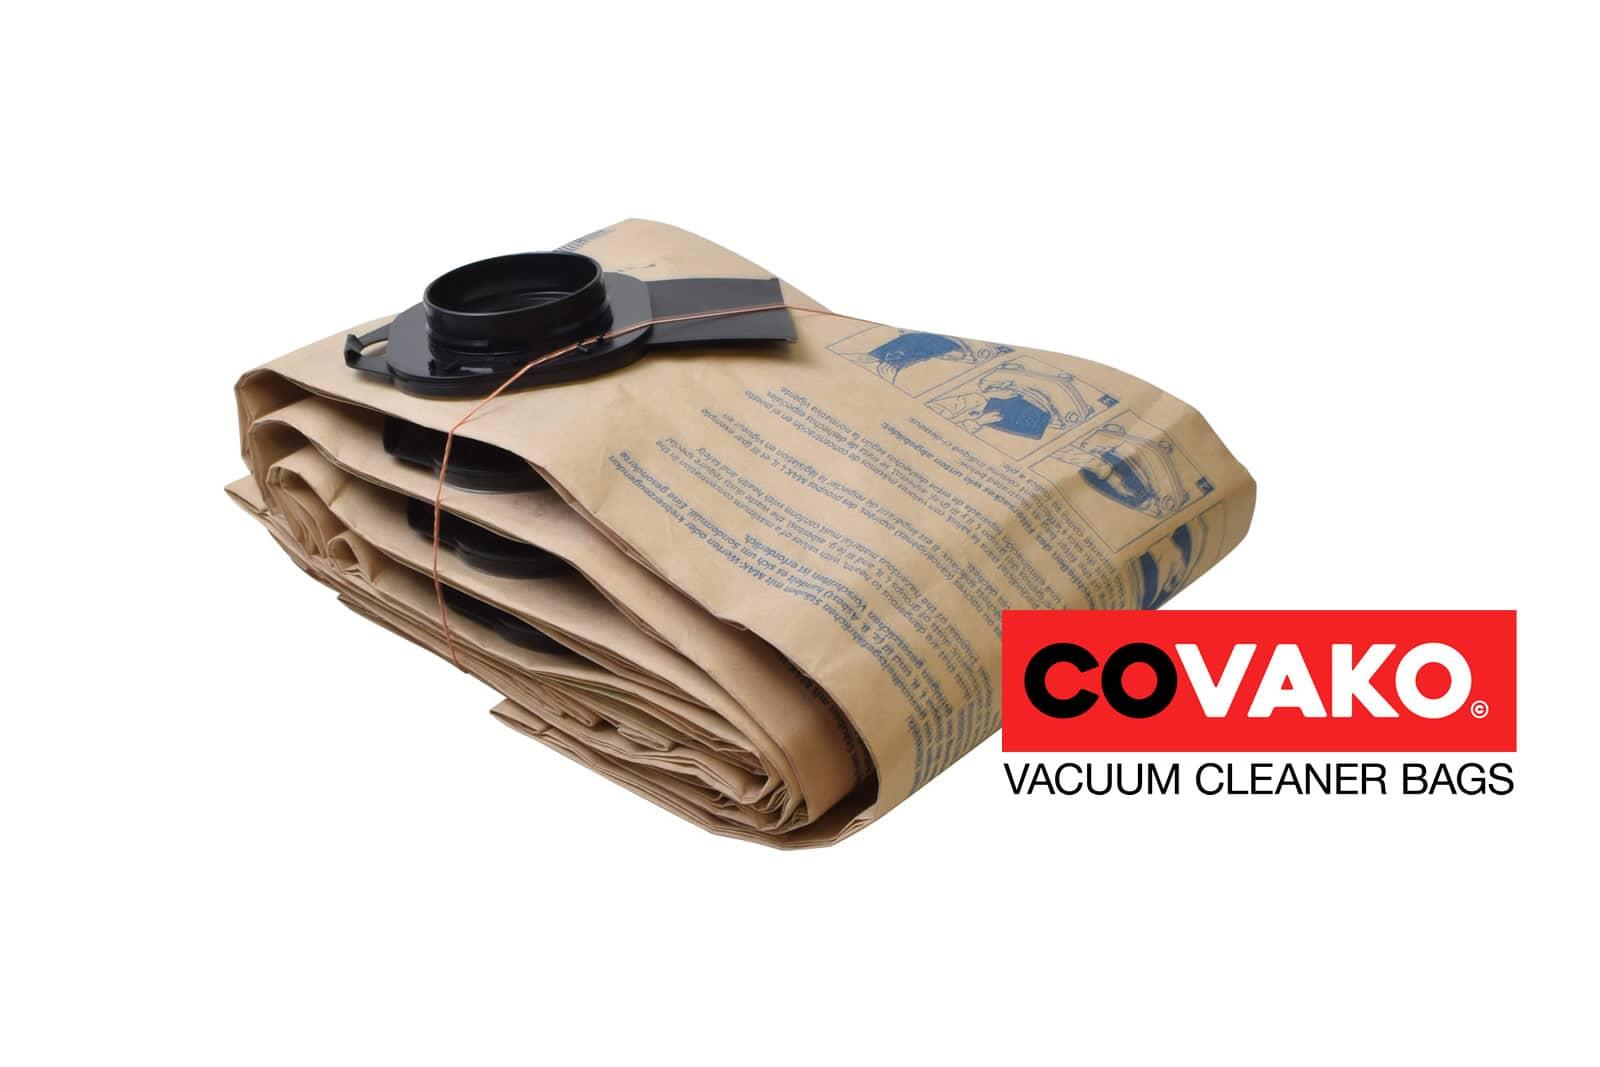 Wap SQ 4 / Papier - Wap sacs d'aspirateur